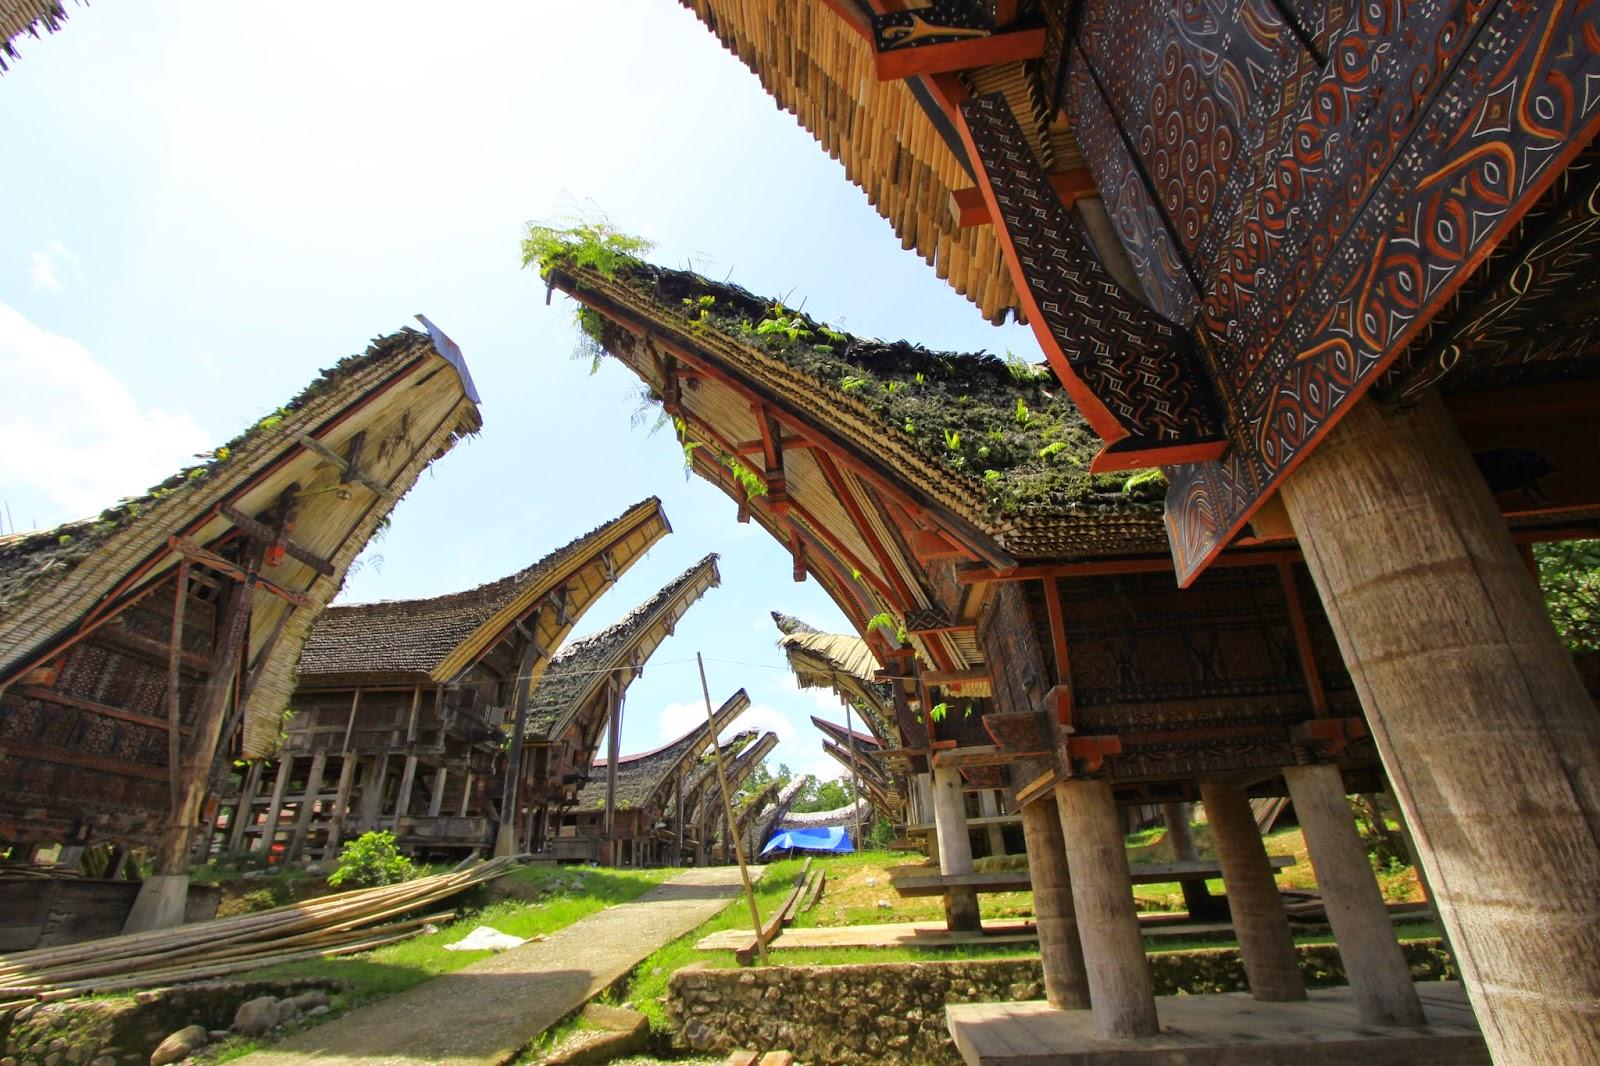 Desa Adat Pallawa Toraja Utara - ARSY Tours & Travel